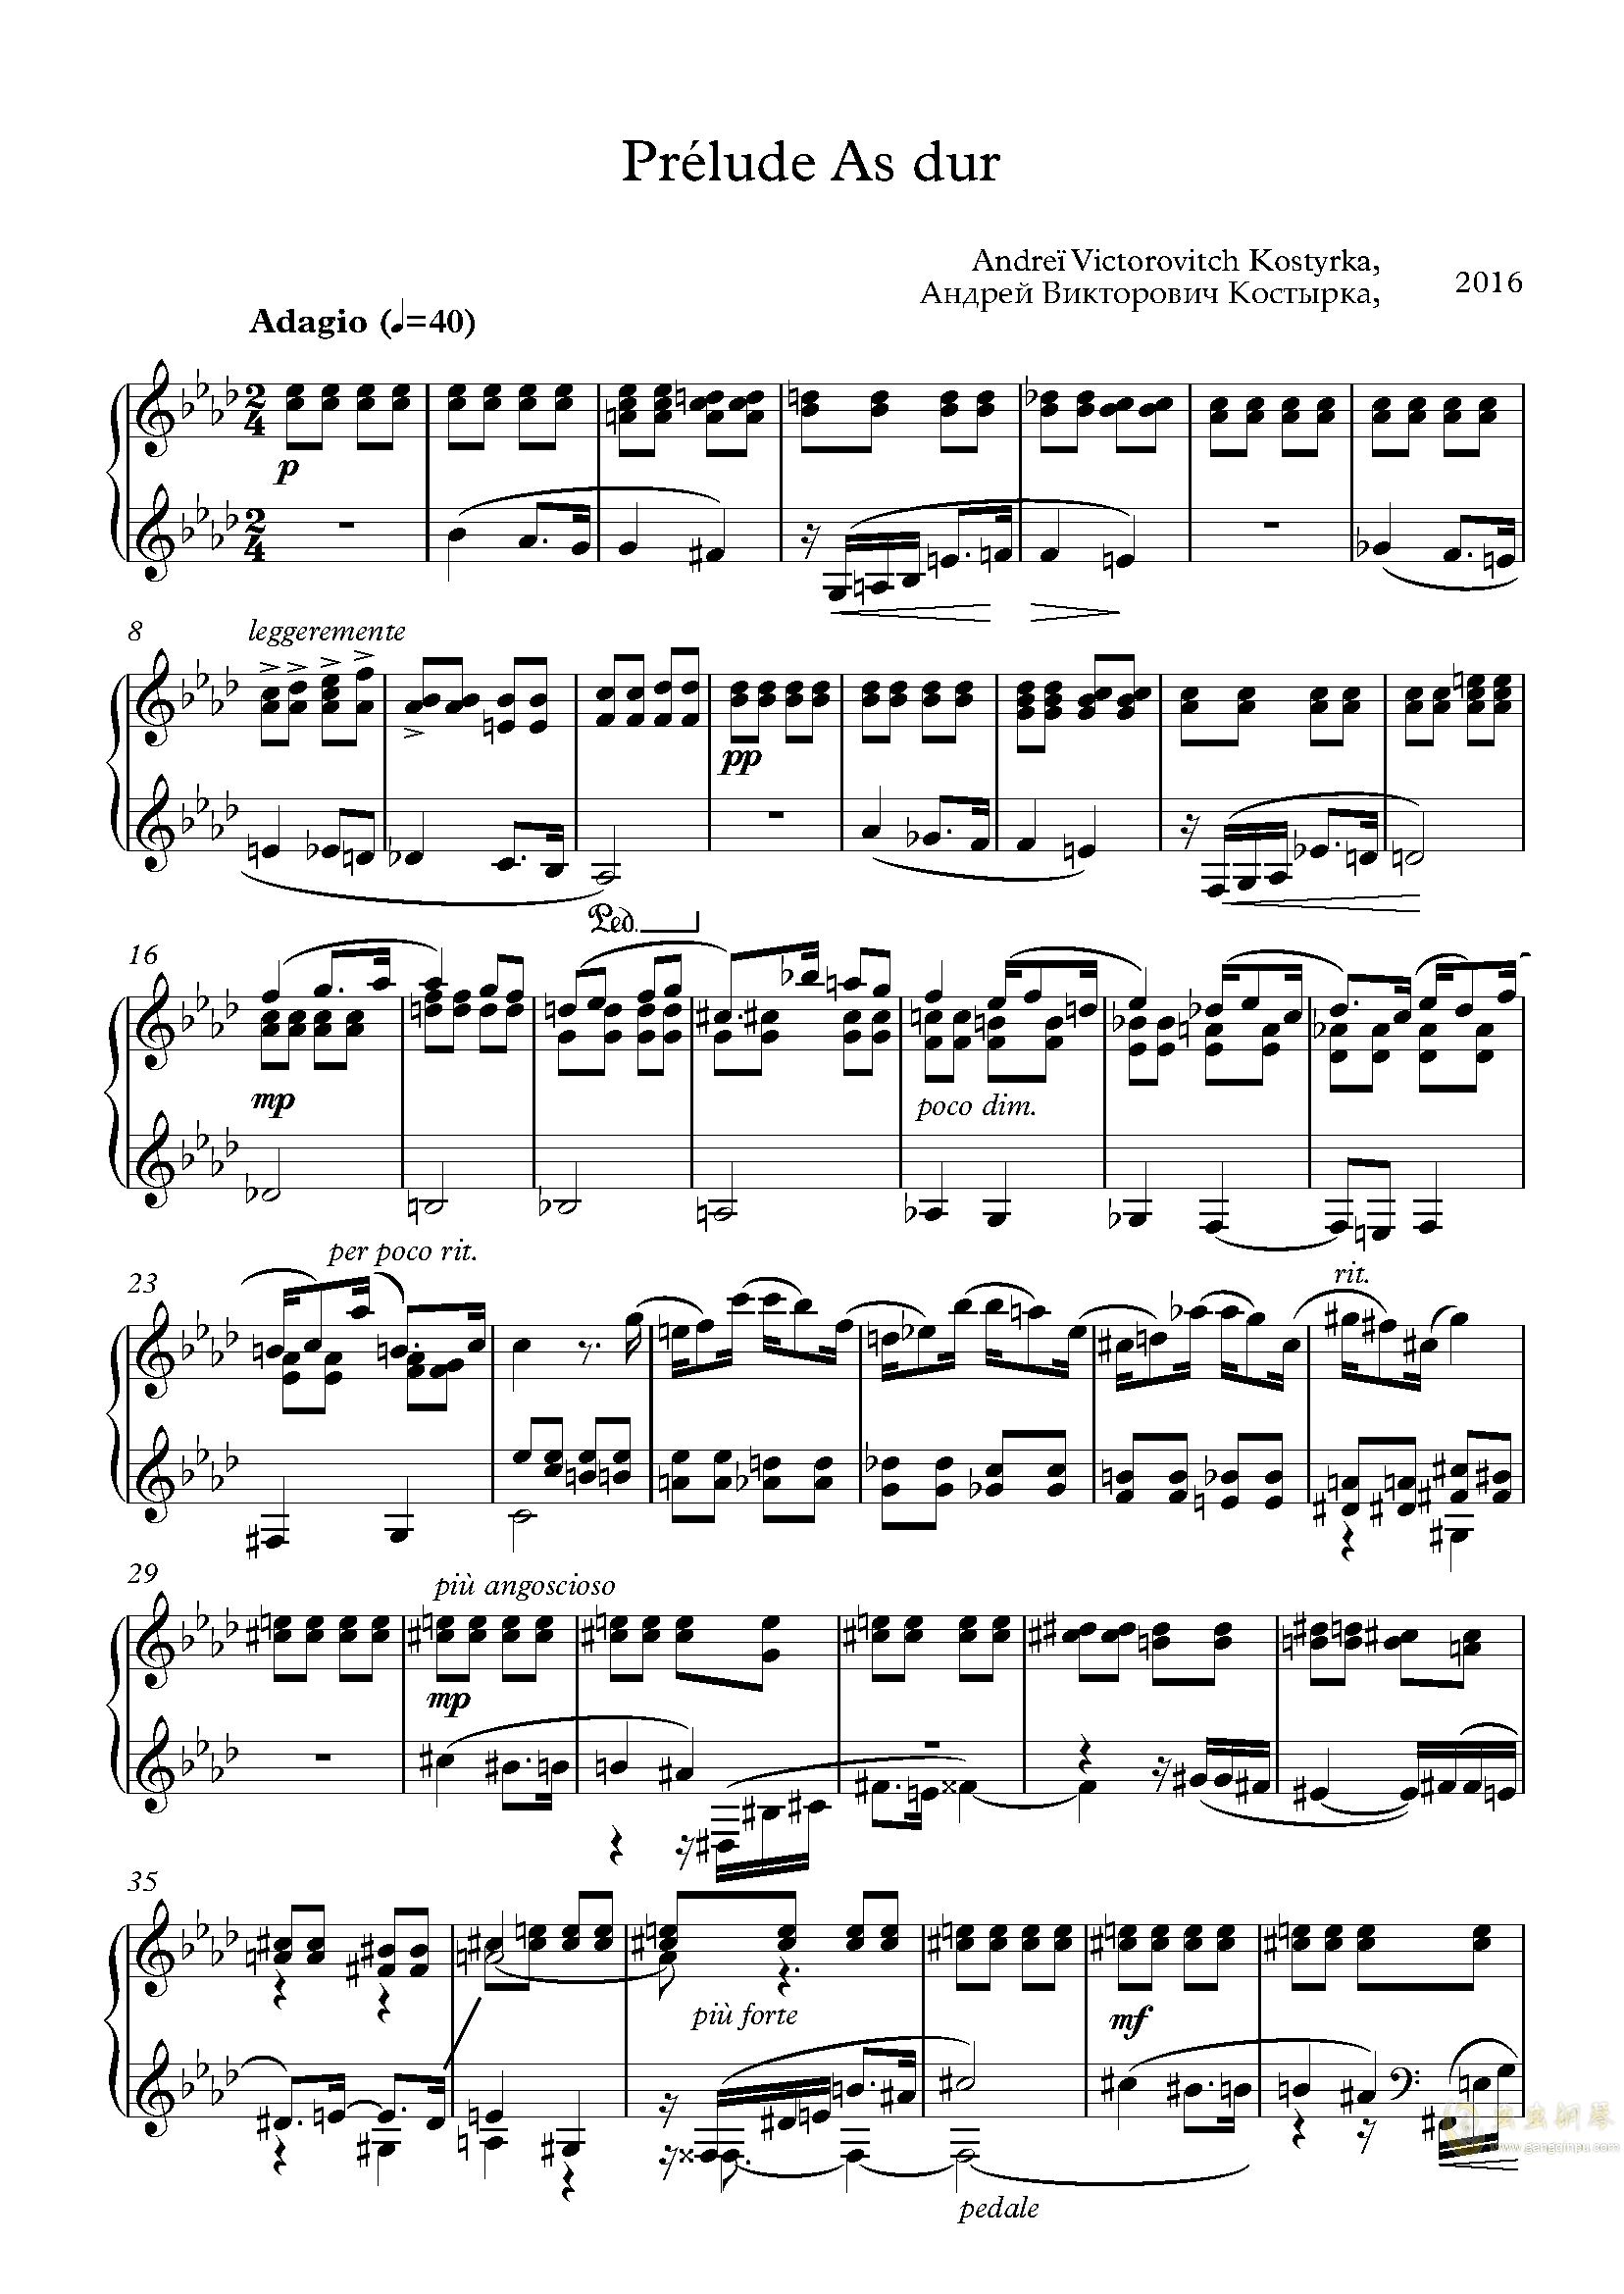 Prelude as dur钢琴谱 第1页